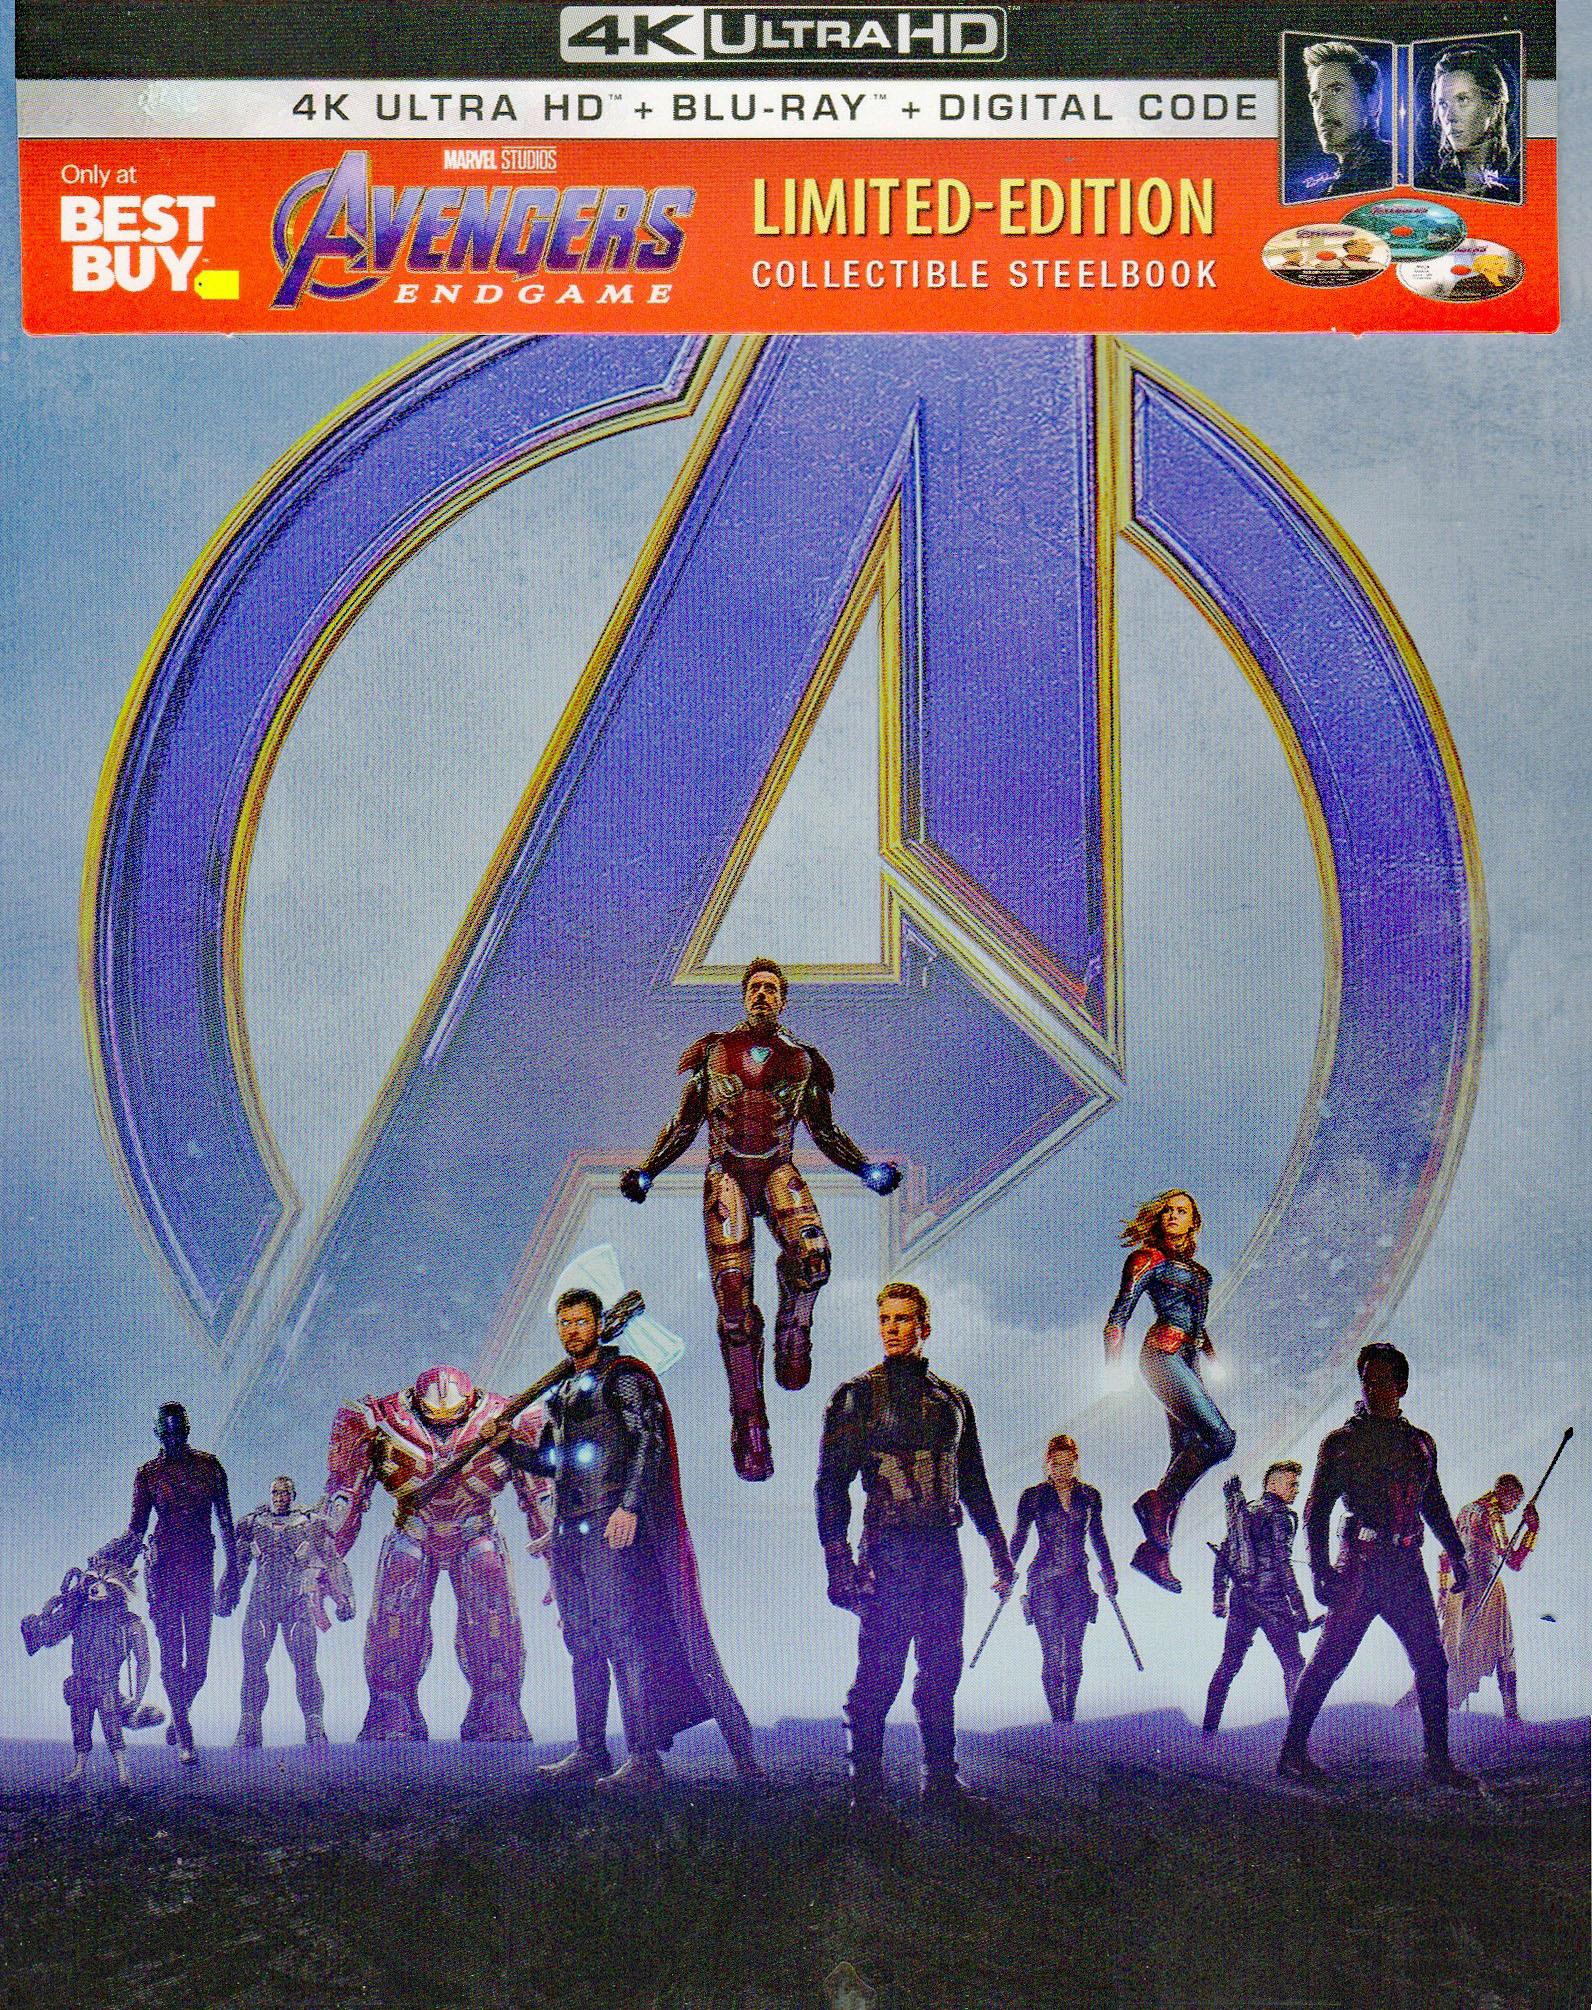 Marvel's AVENGERS: ENDGAME Is Now Available On 4K Ultra HD